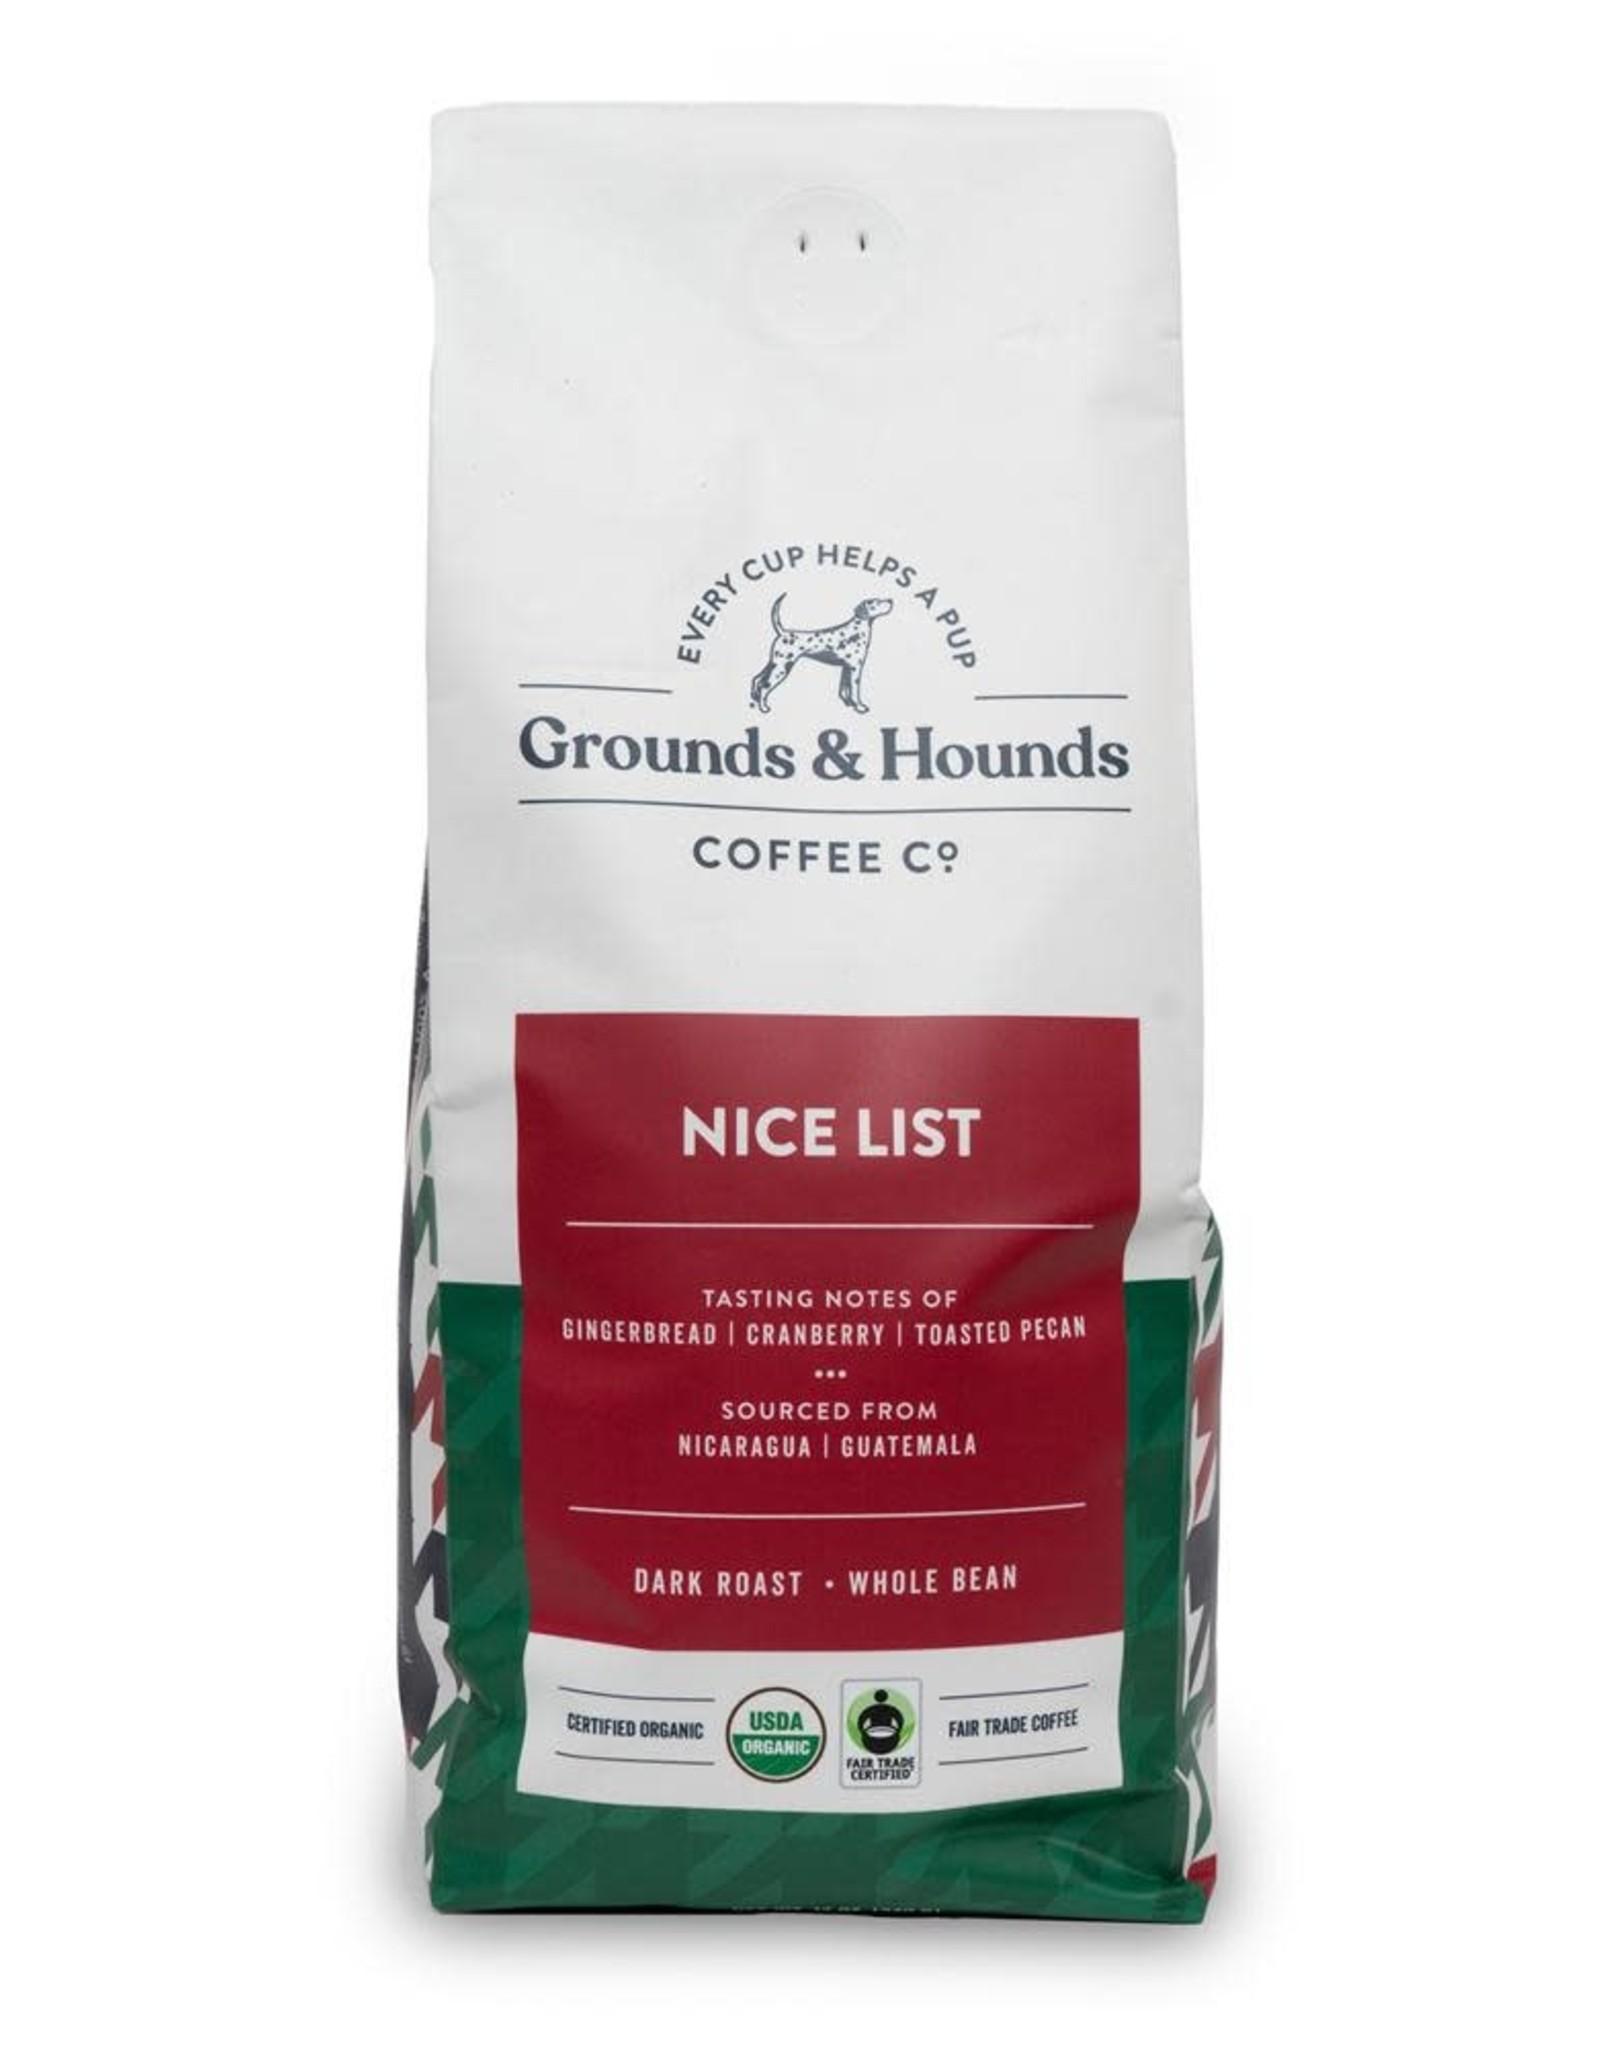 Grounds & Hounds Whole Bean Coffee Nice List